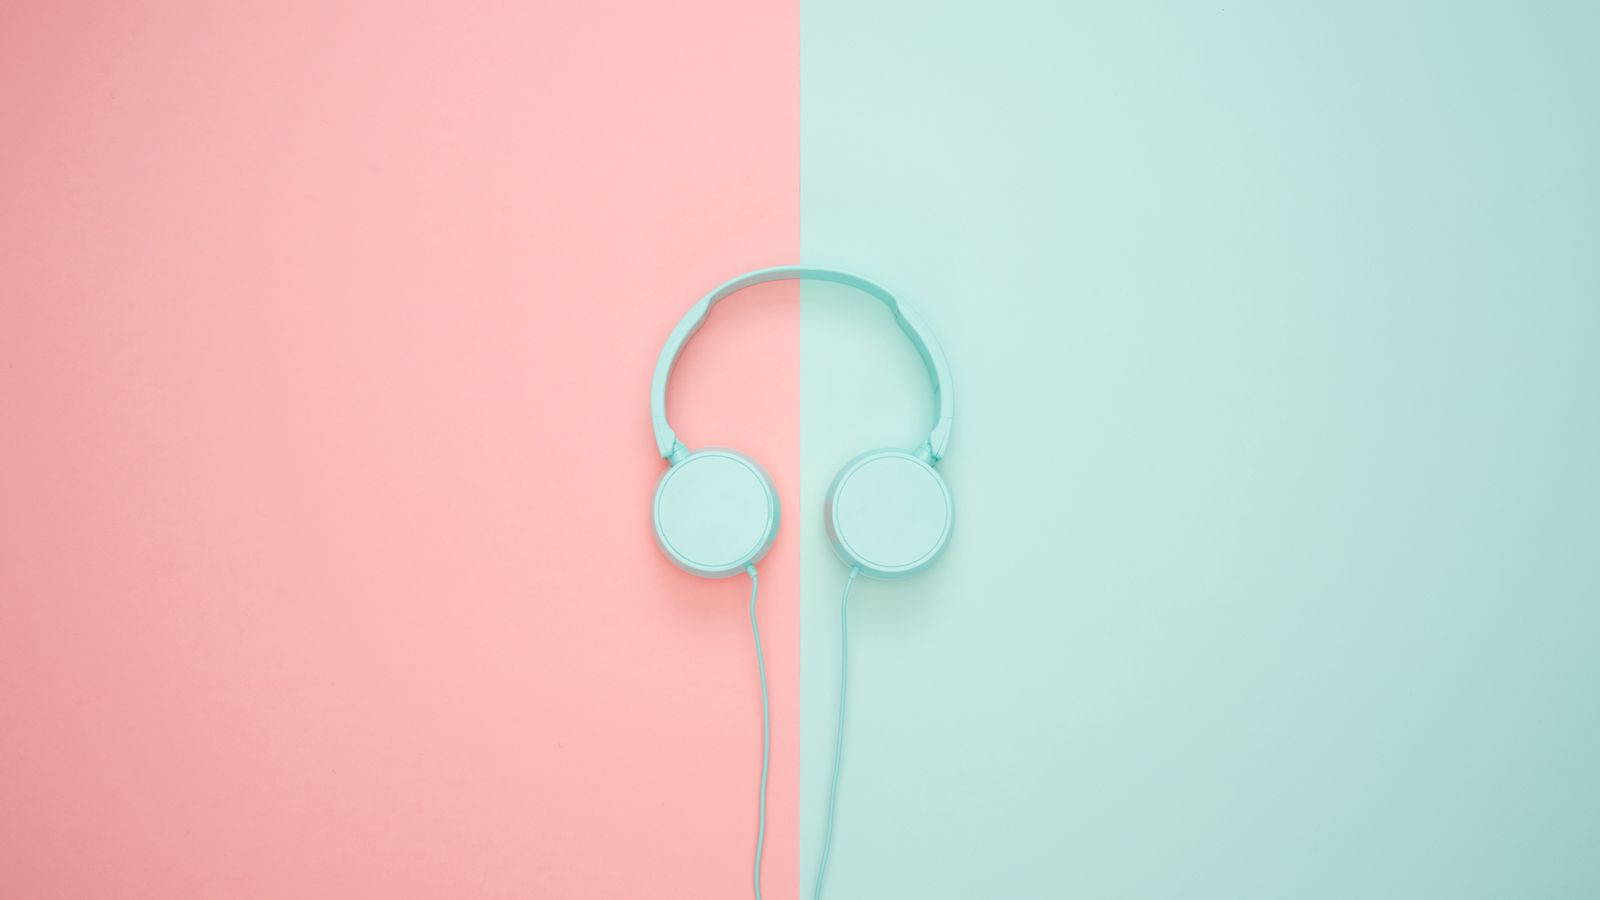 1600x900 Wallpaper headphones, minimalism, pastel, pink